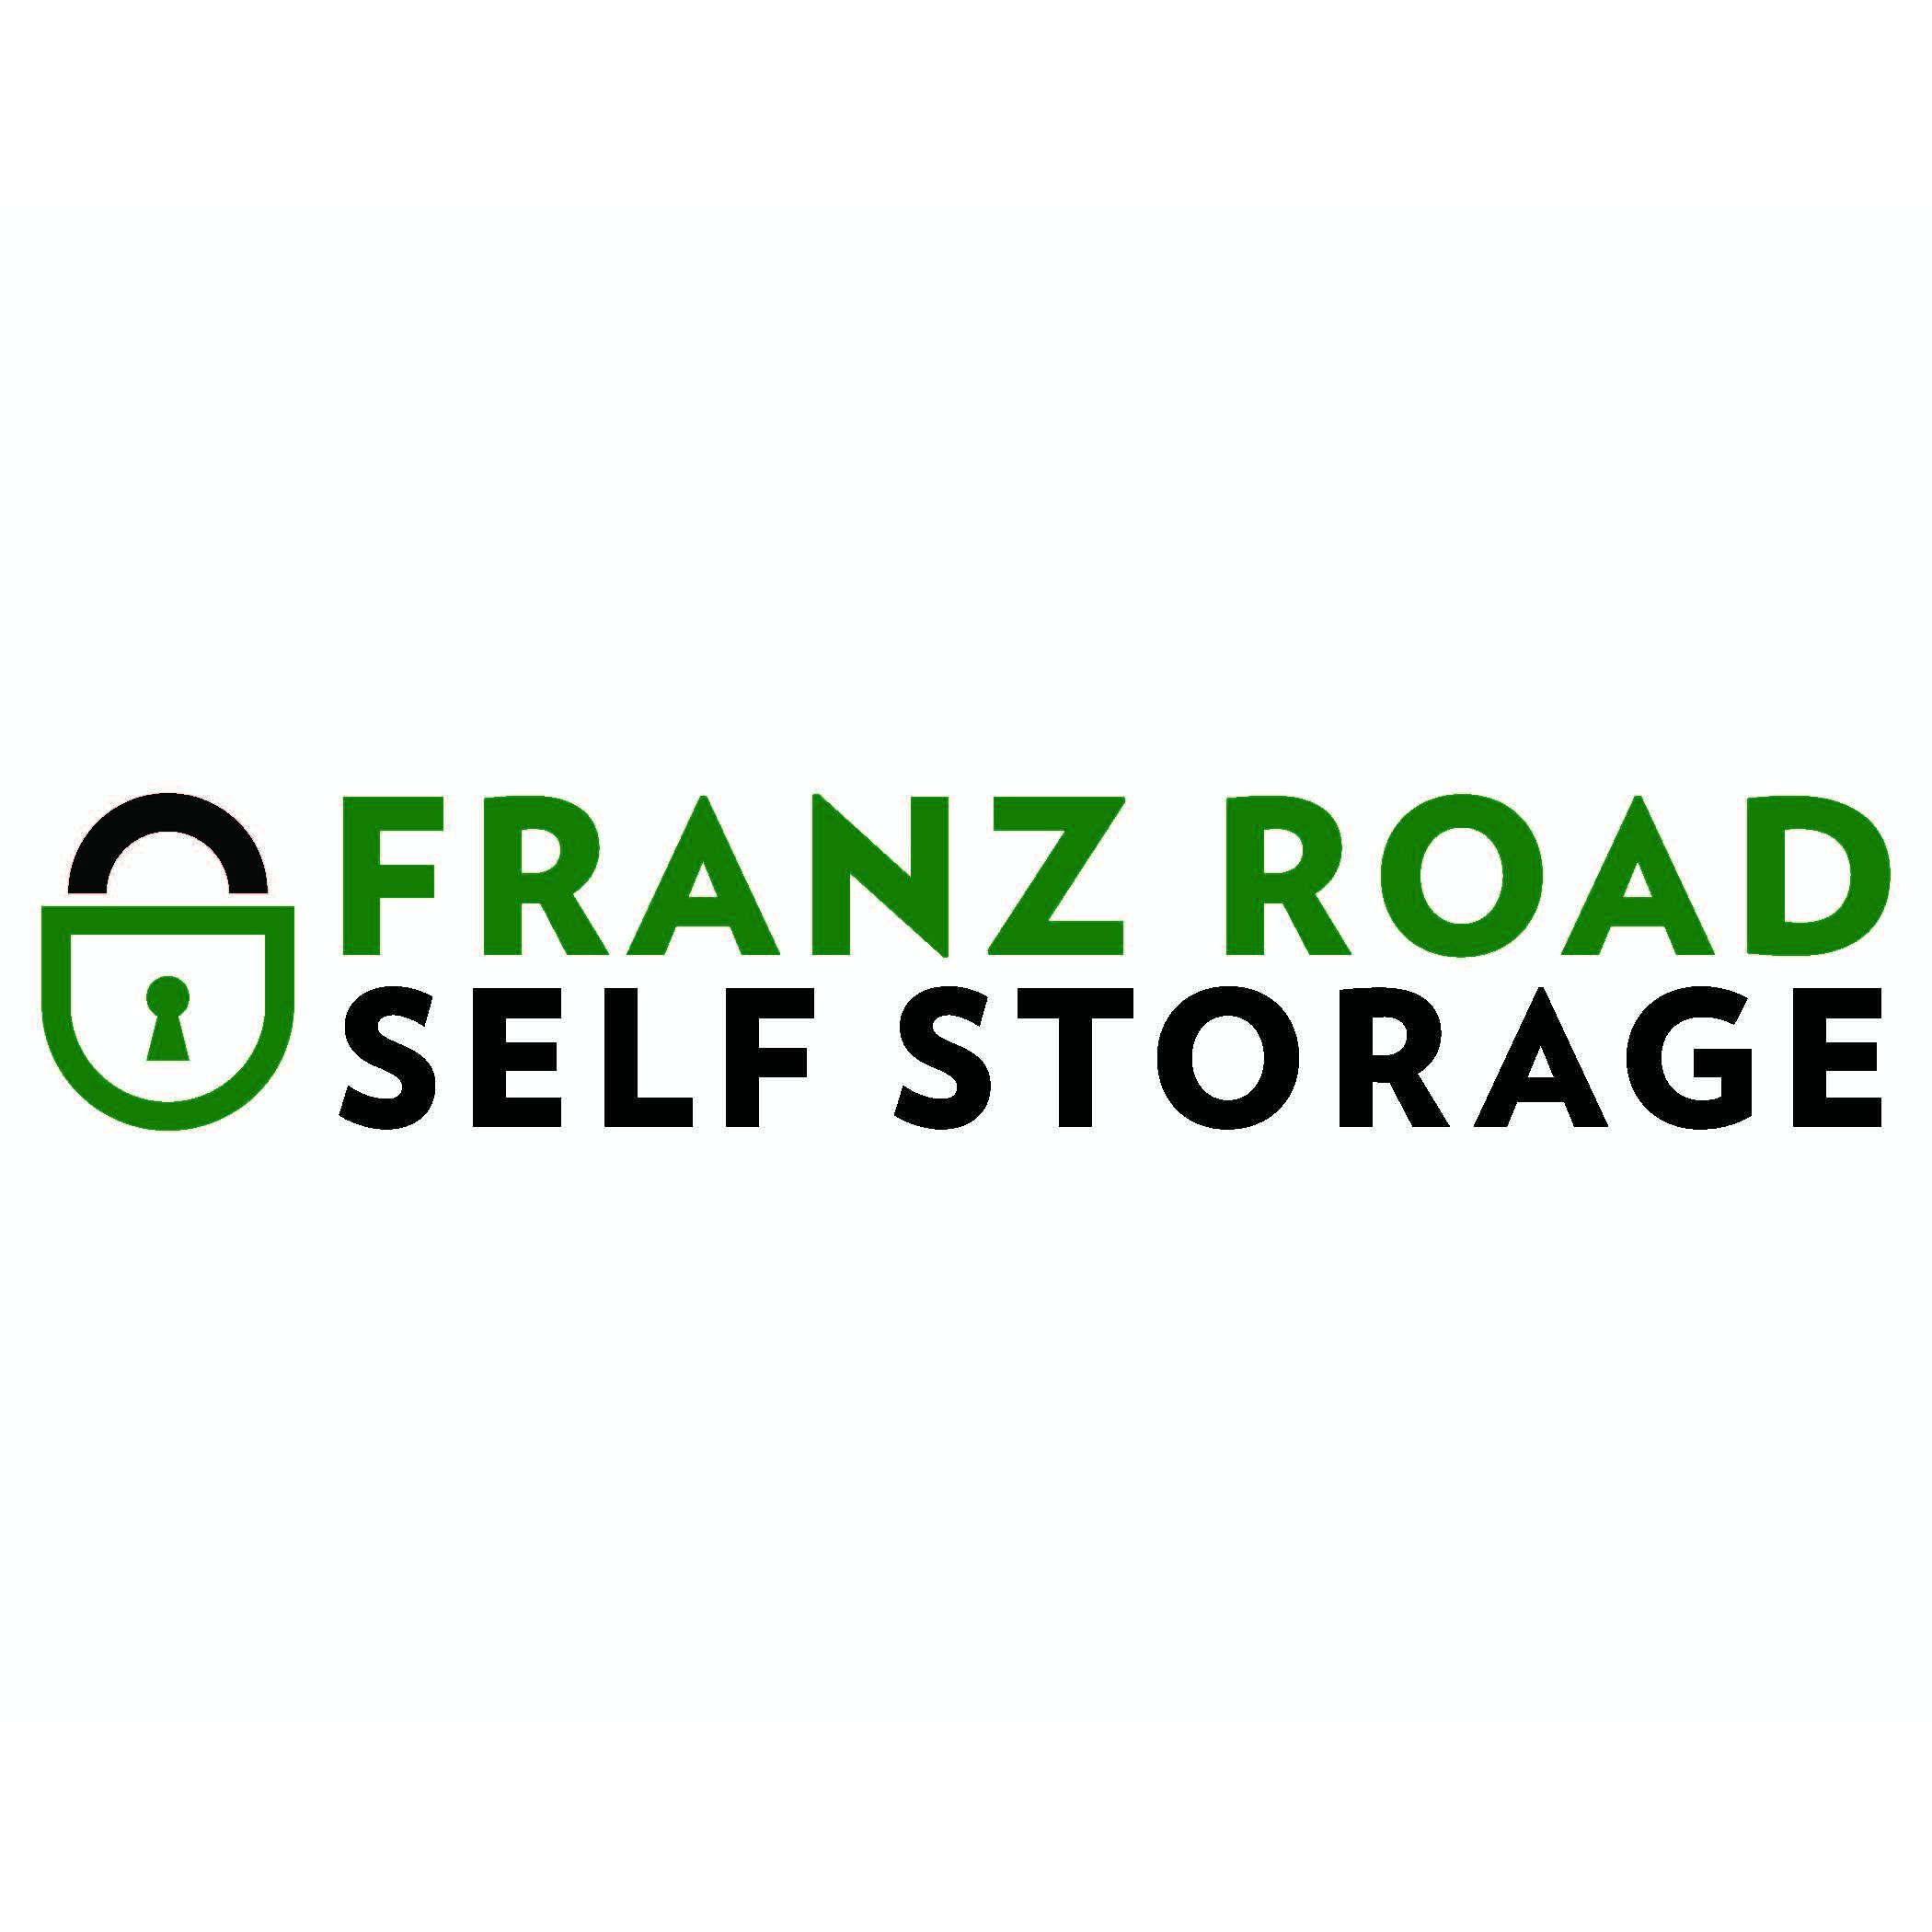 Franz Road Self Storage